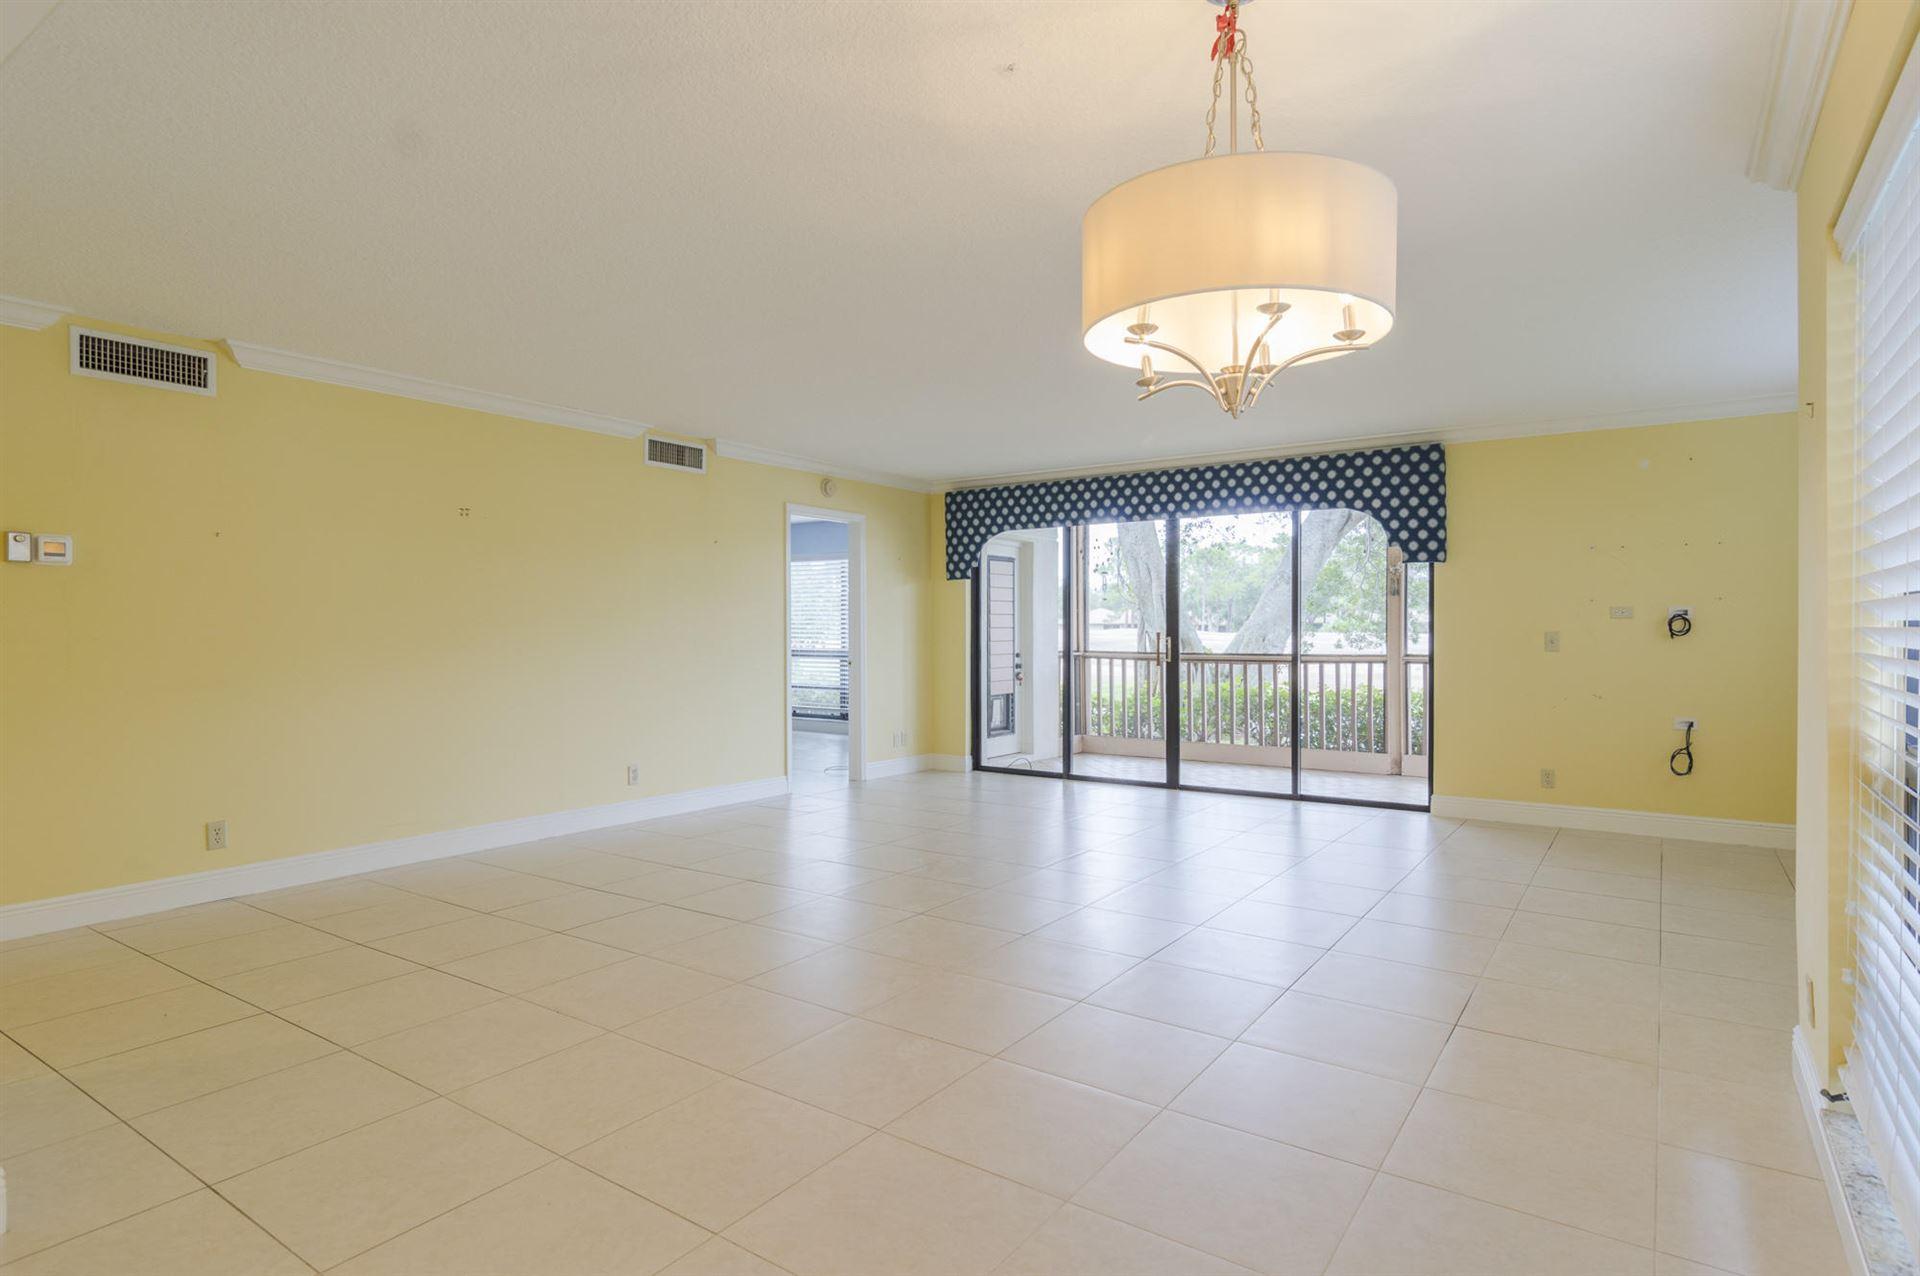 Photo of 445 Brackenwood Lane N, Palm Beach Gardens, FL 33418 (MLS # RX-10629567)